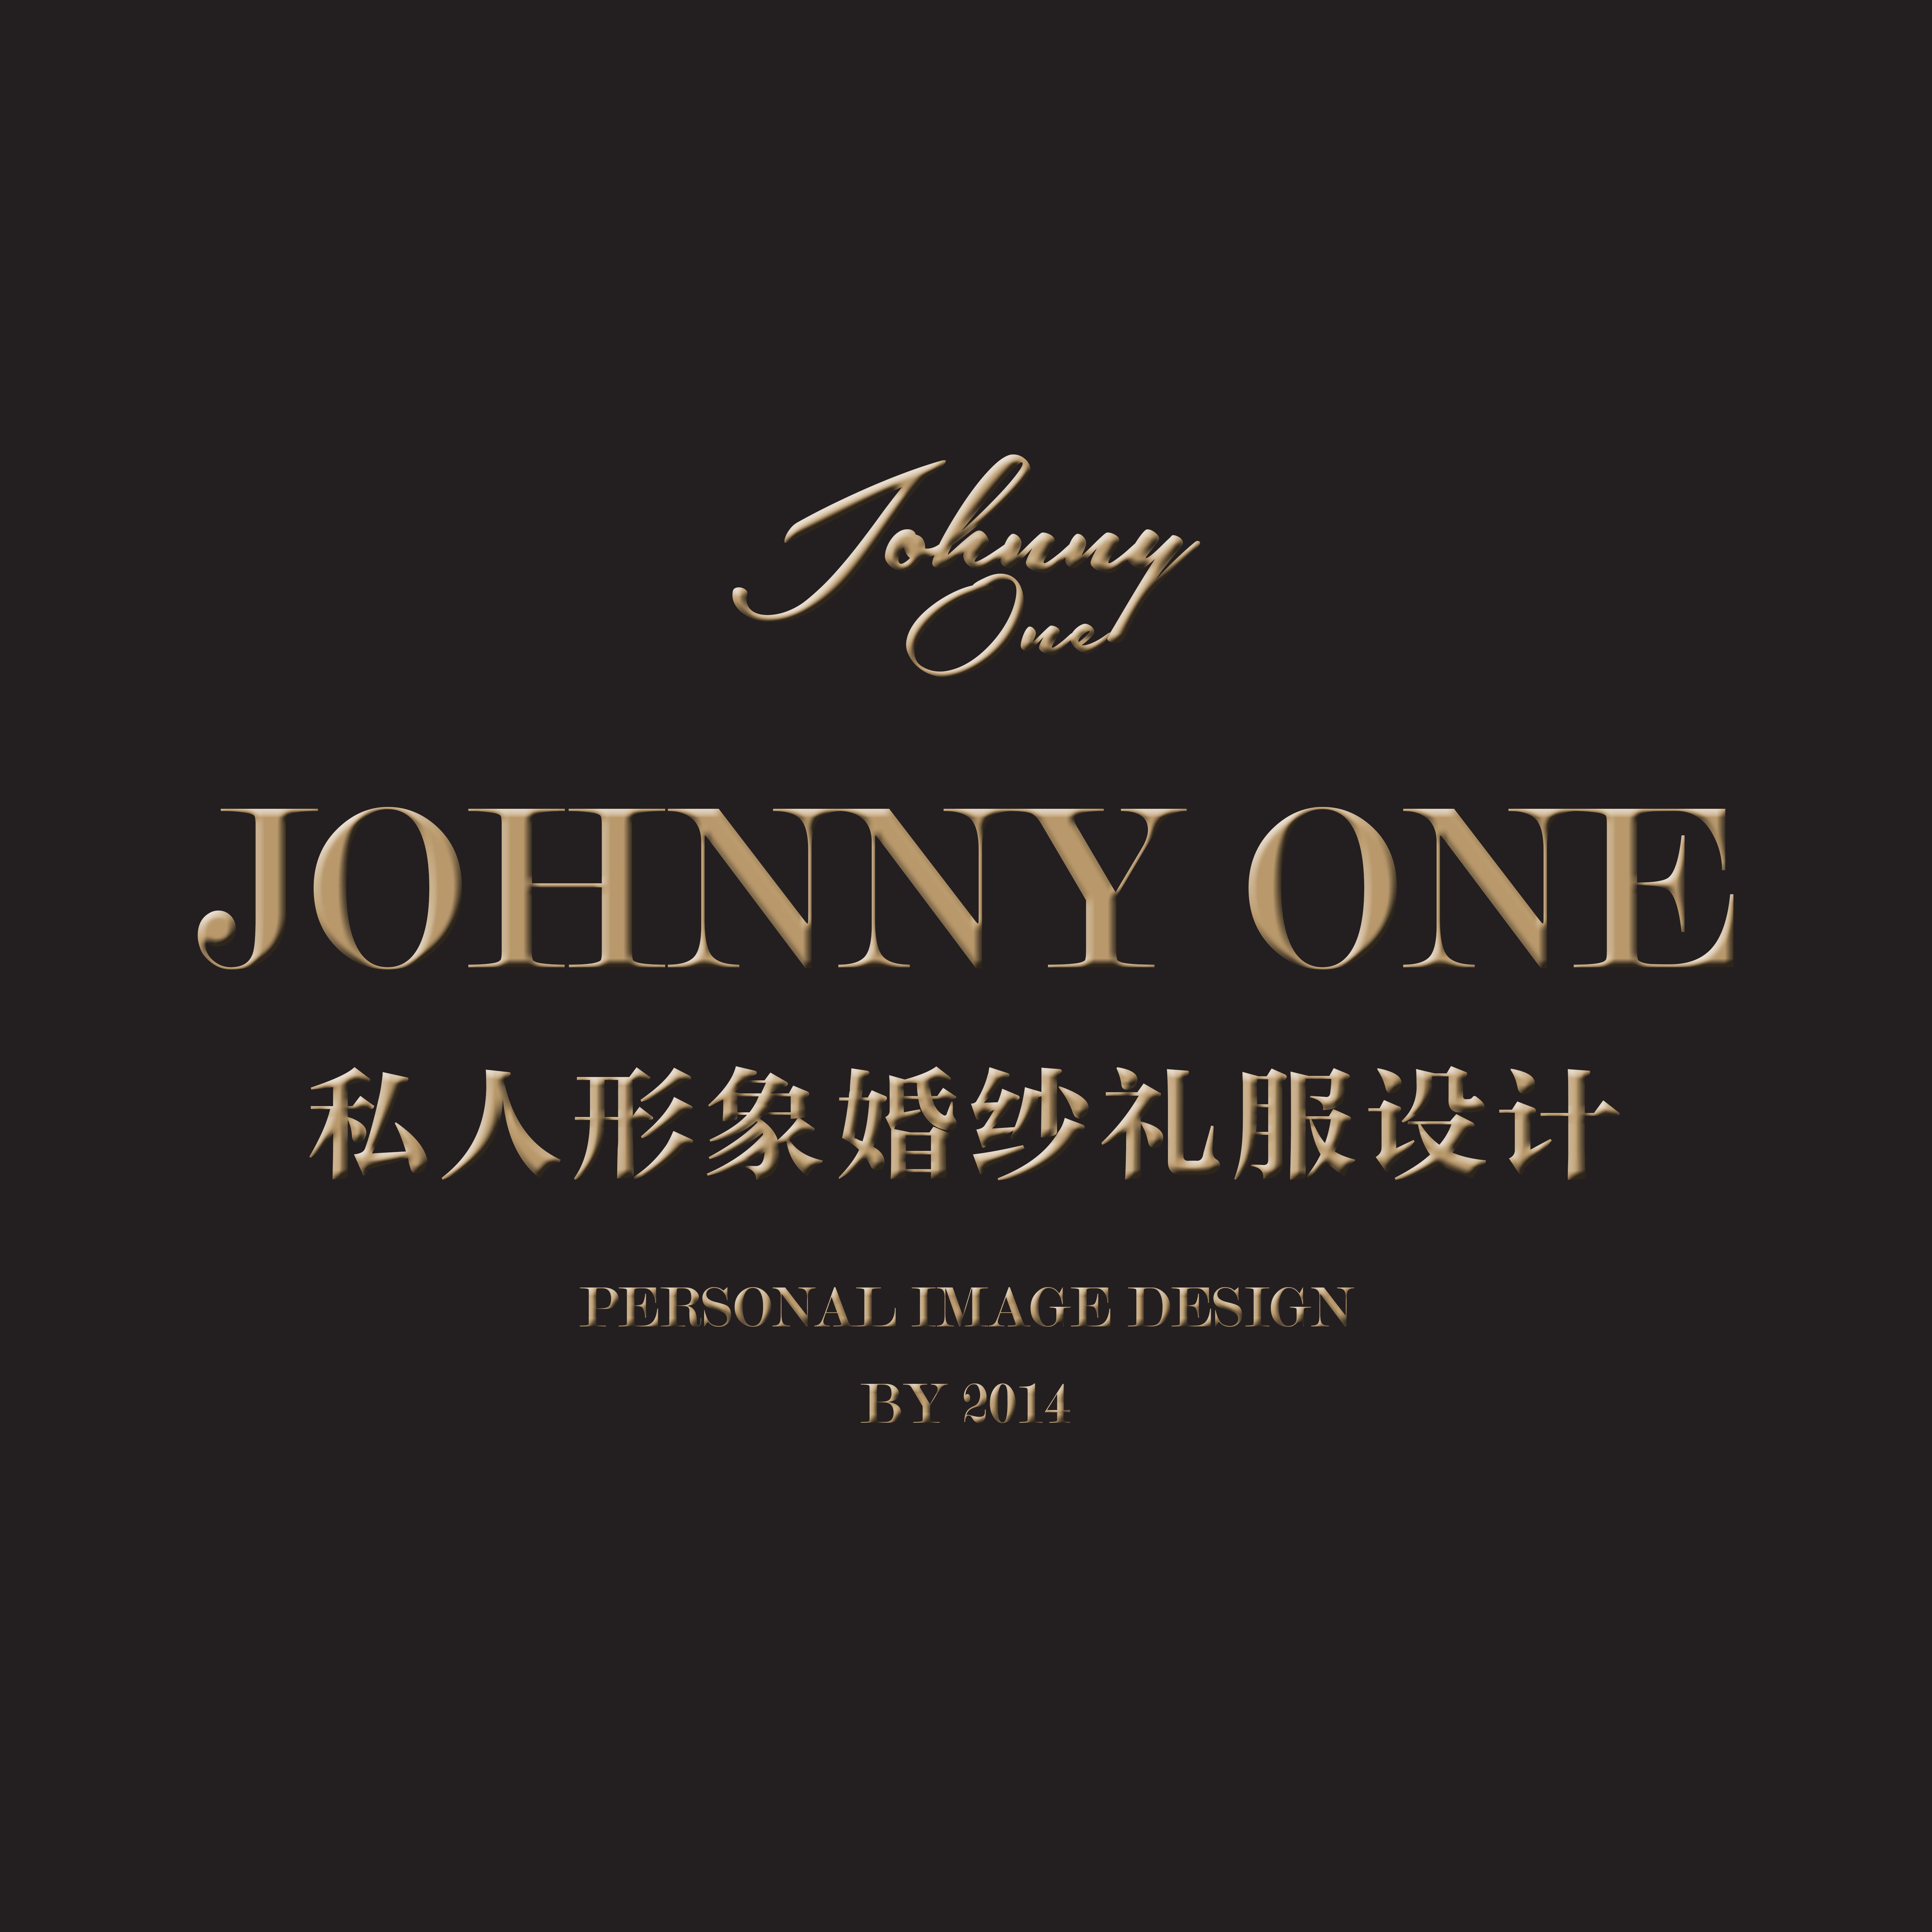 JOHNNY ONE私人婚纱礼服设计